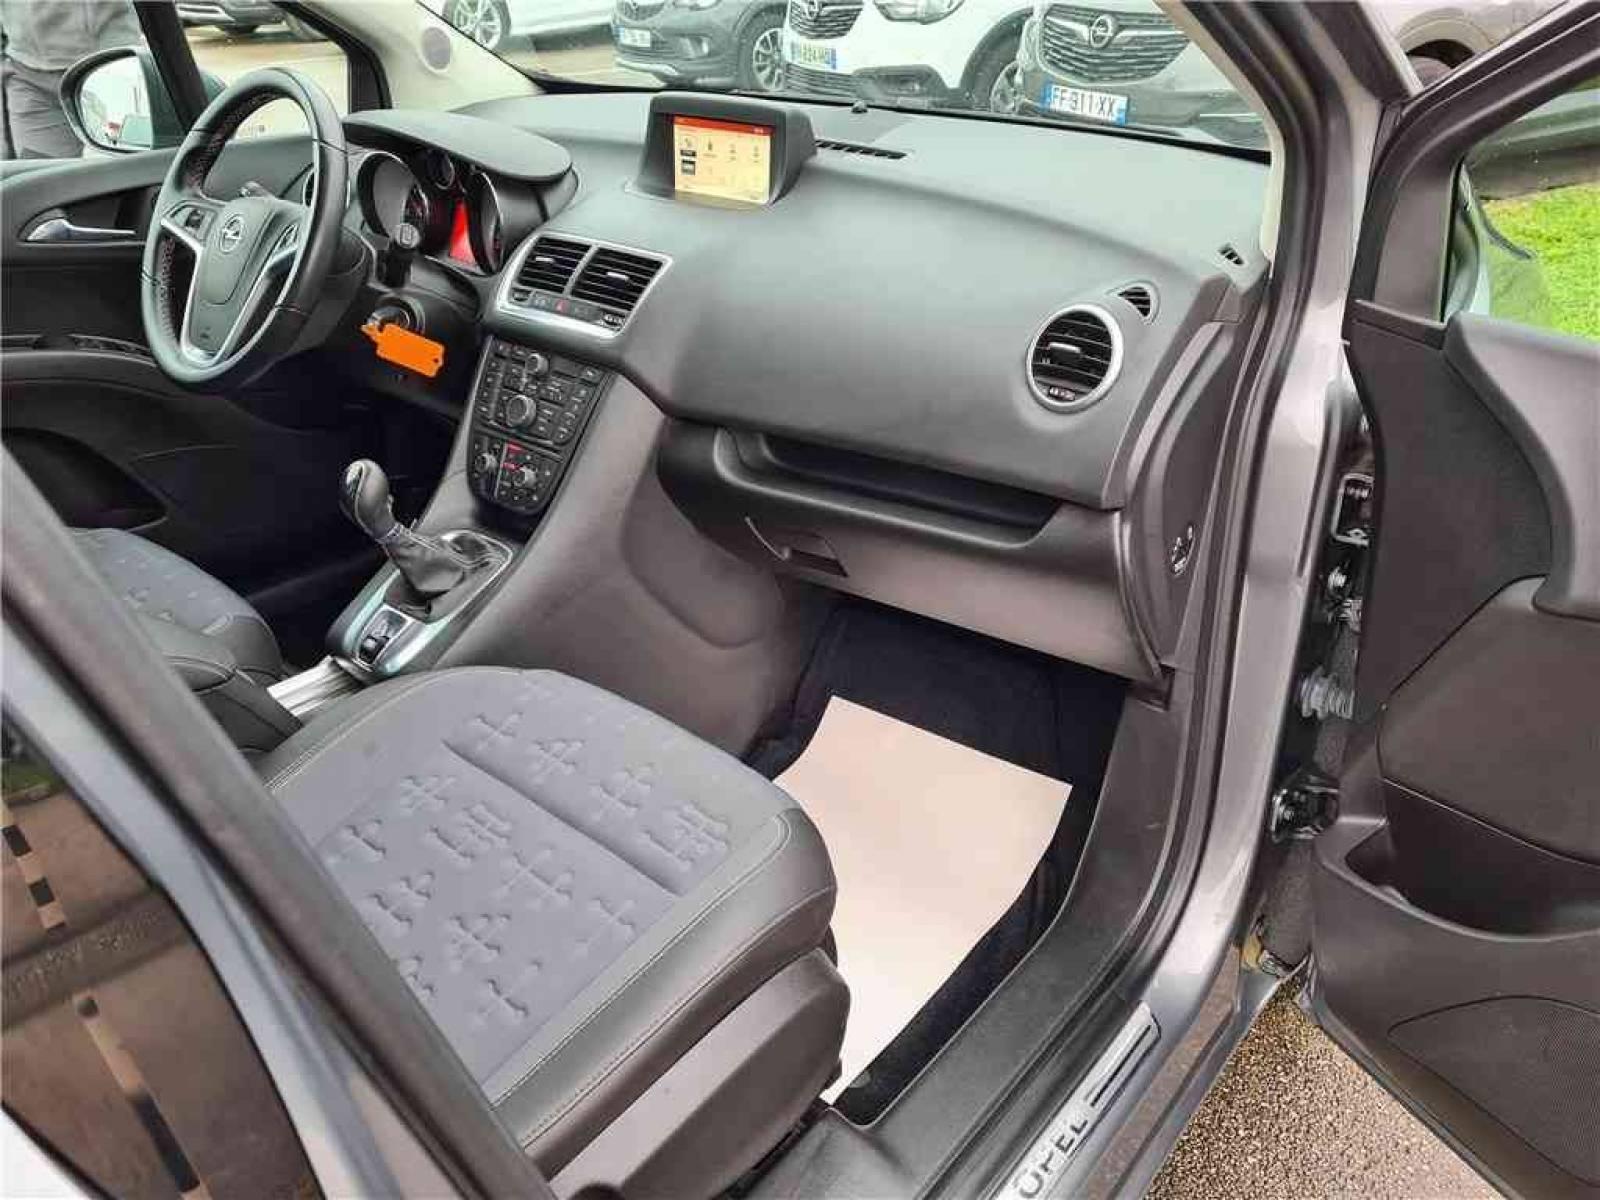 OPEL Meriva 1.6 CDTI - 110 ch Start/Stop - véhicule d'occasion - Groupe Guillet - Opel Magicauto - Chalon-sur-Saône - 71380 - Saint-Marcel - 45